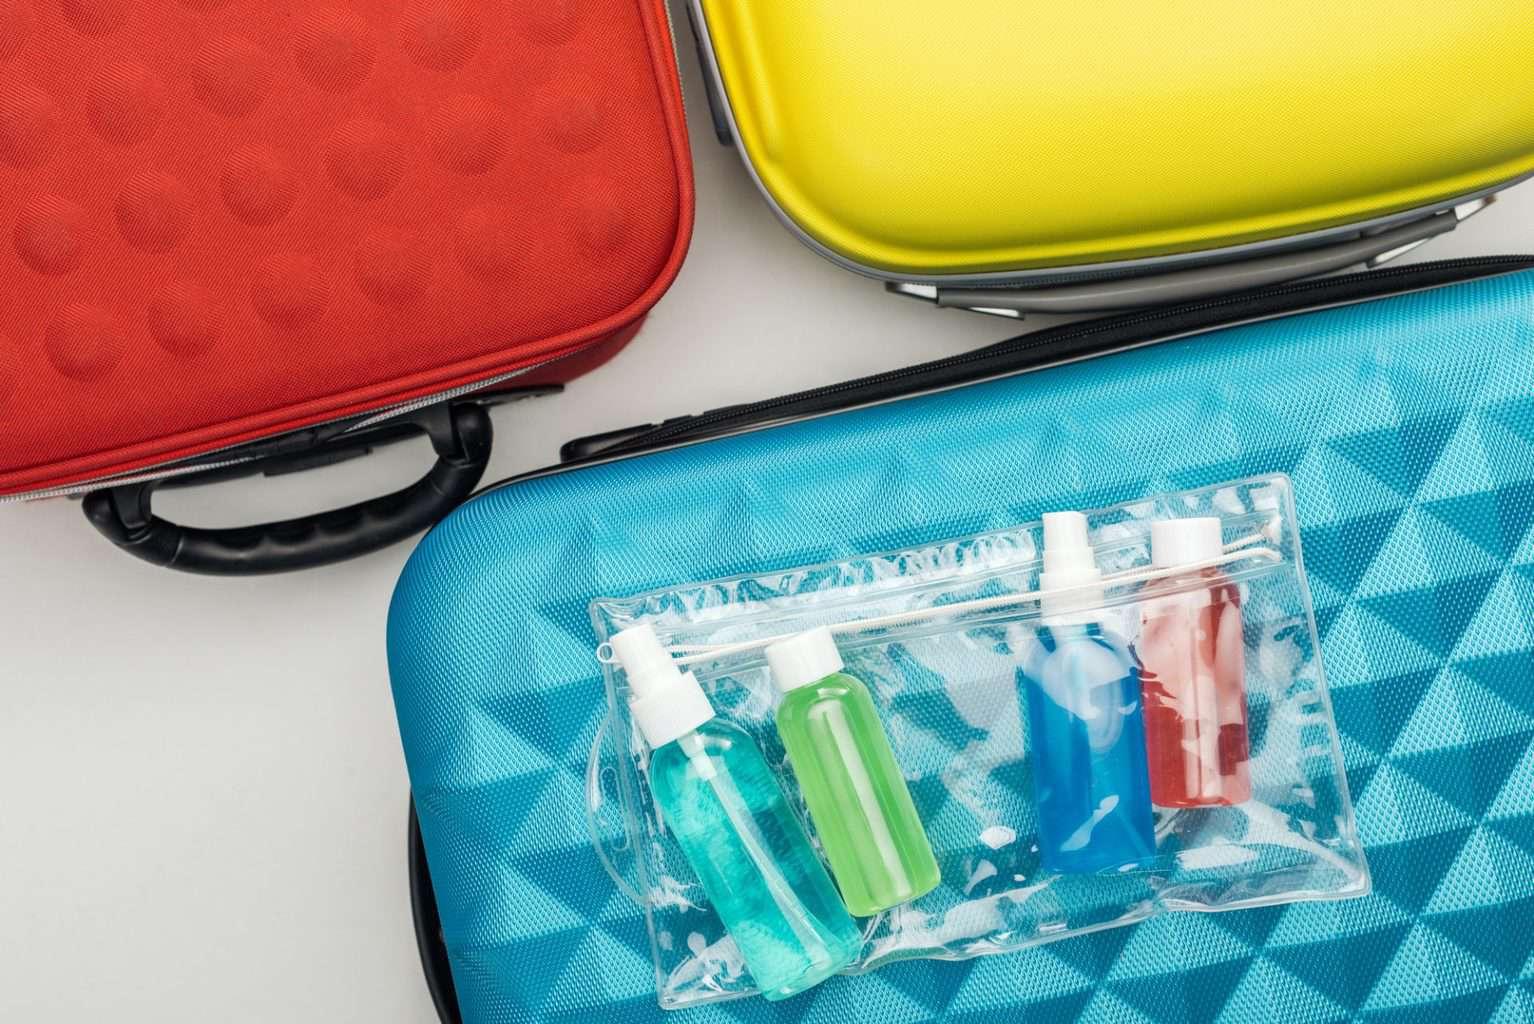 Best silicone travel bottles